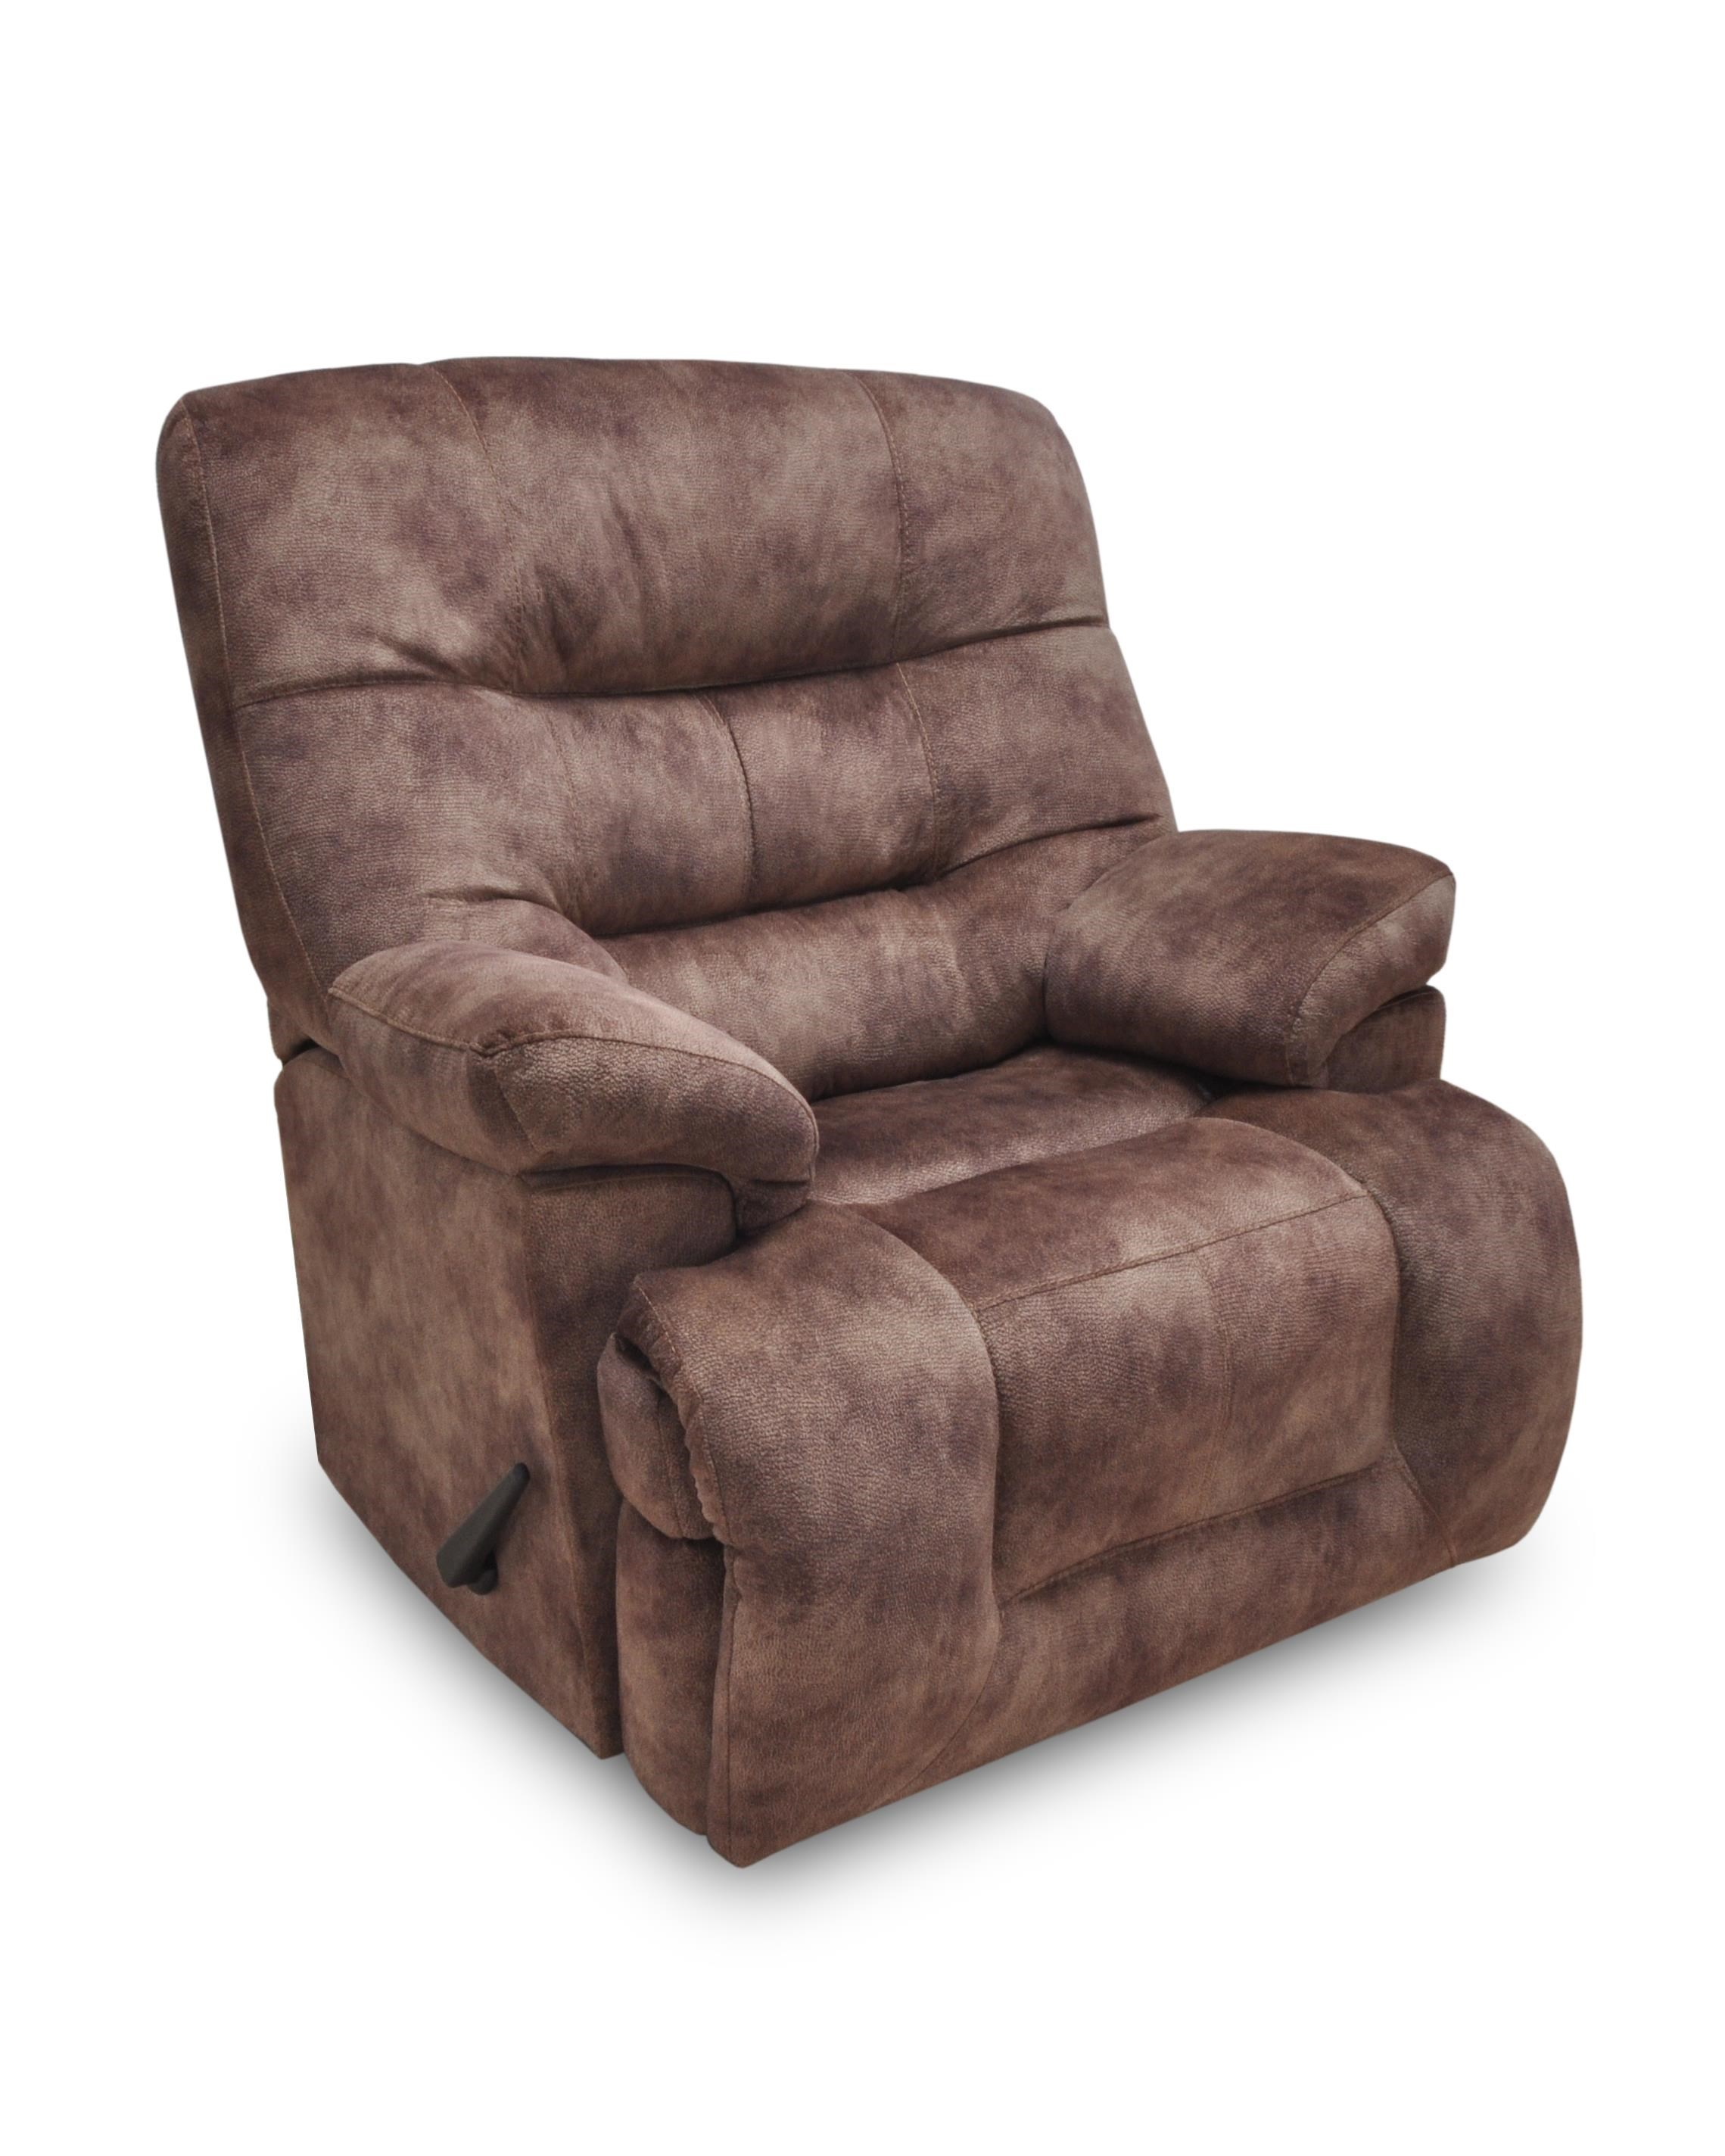 franklin recliners boss bark rocker recliner